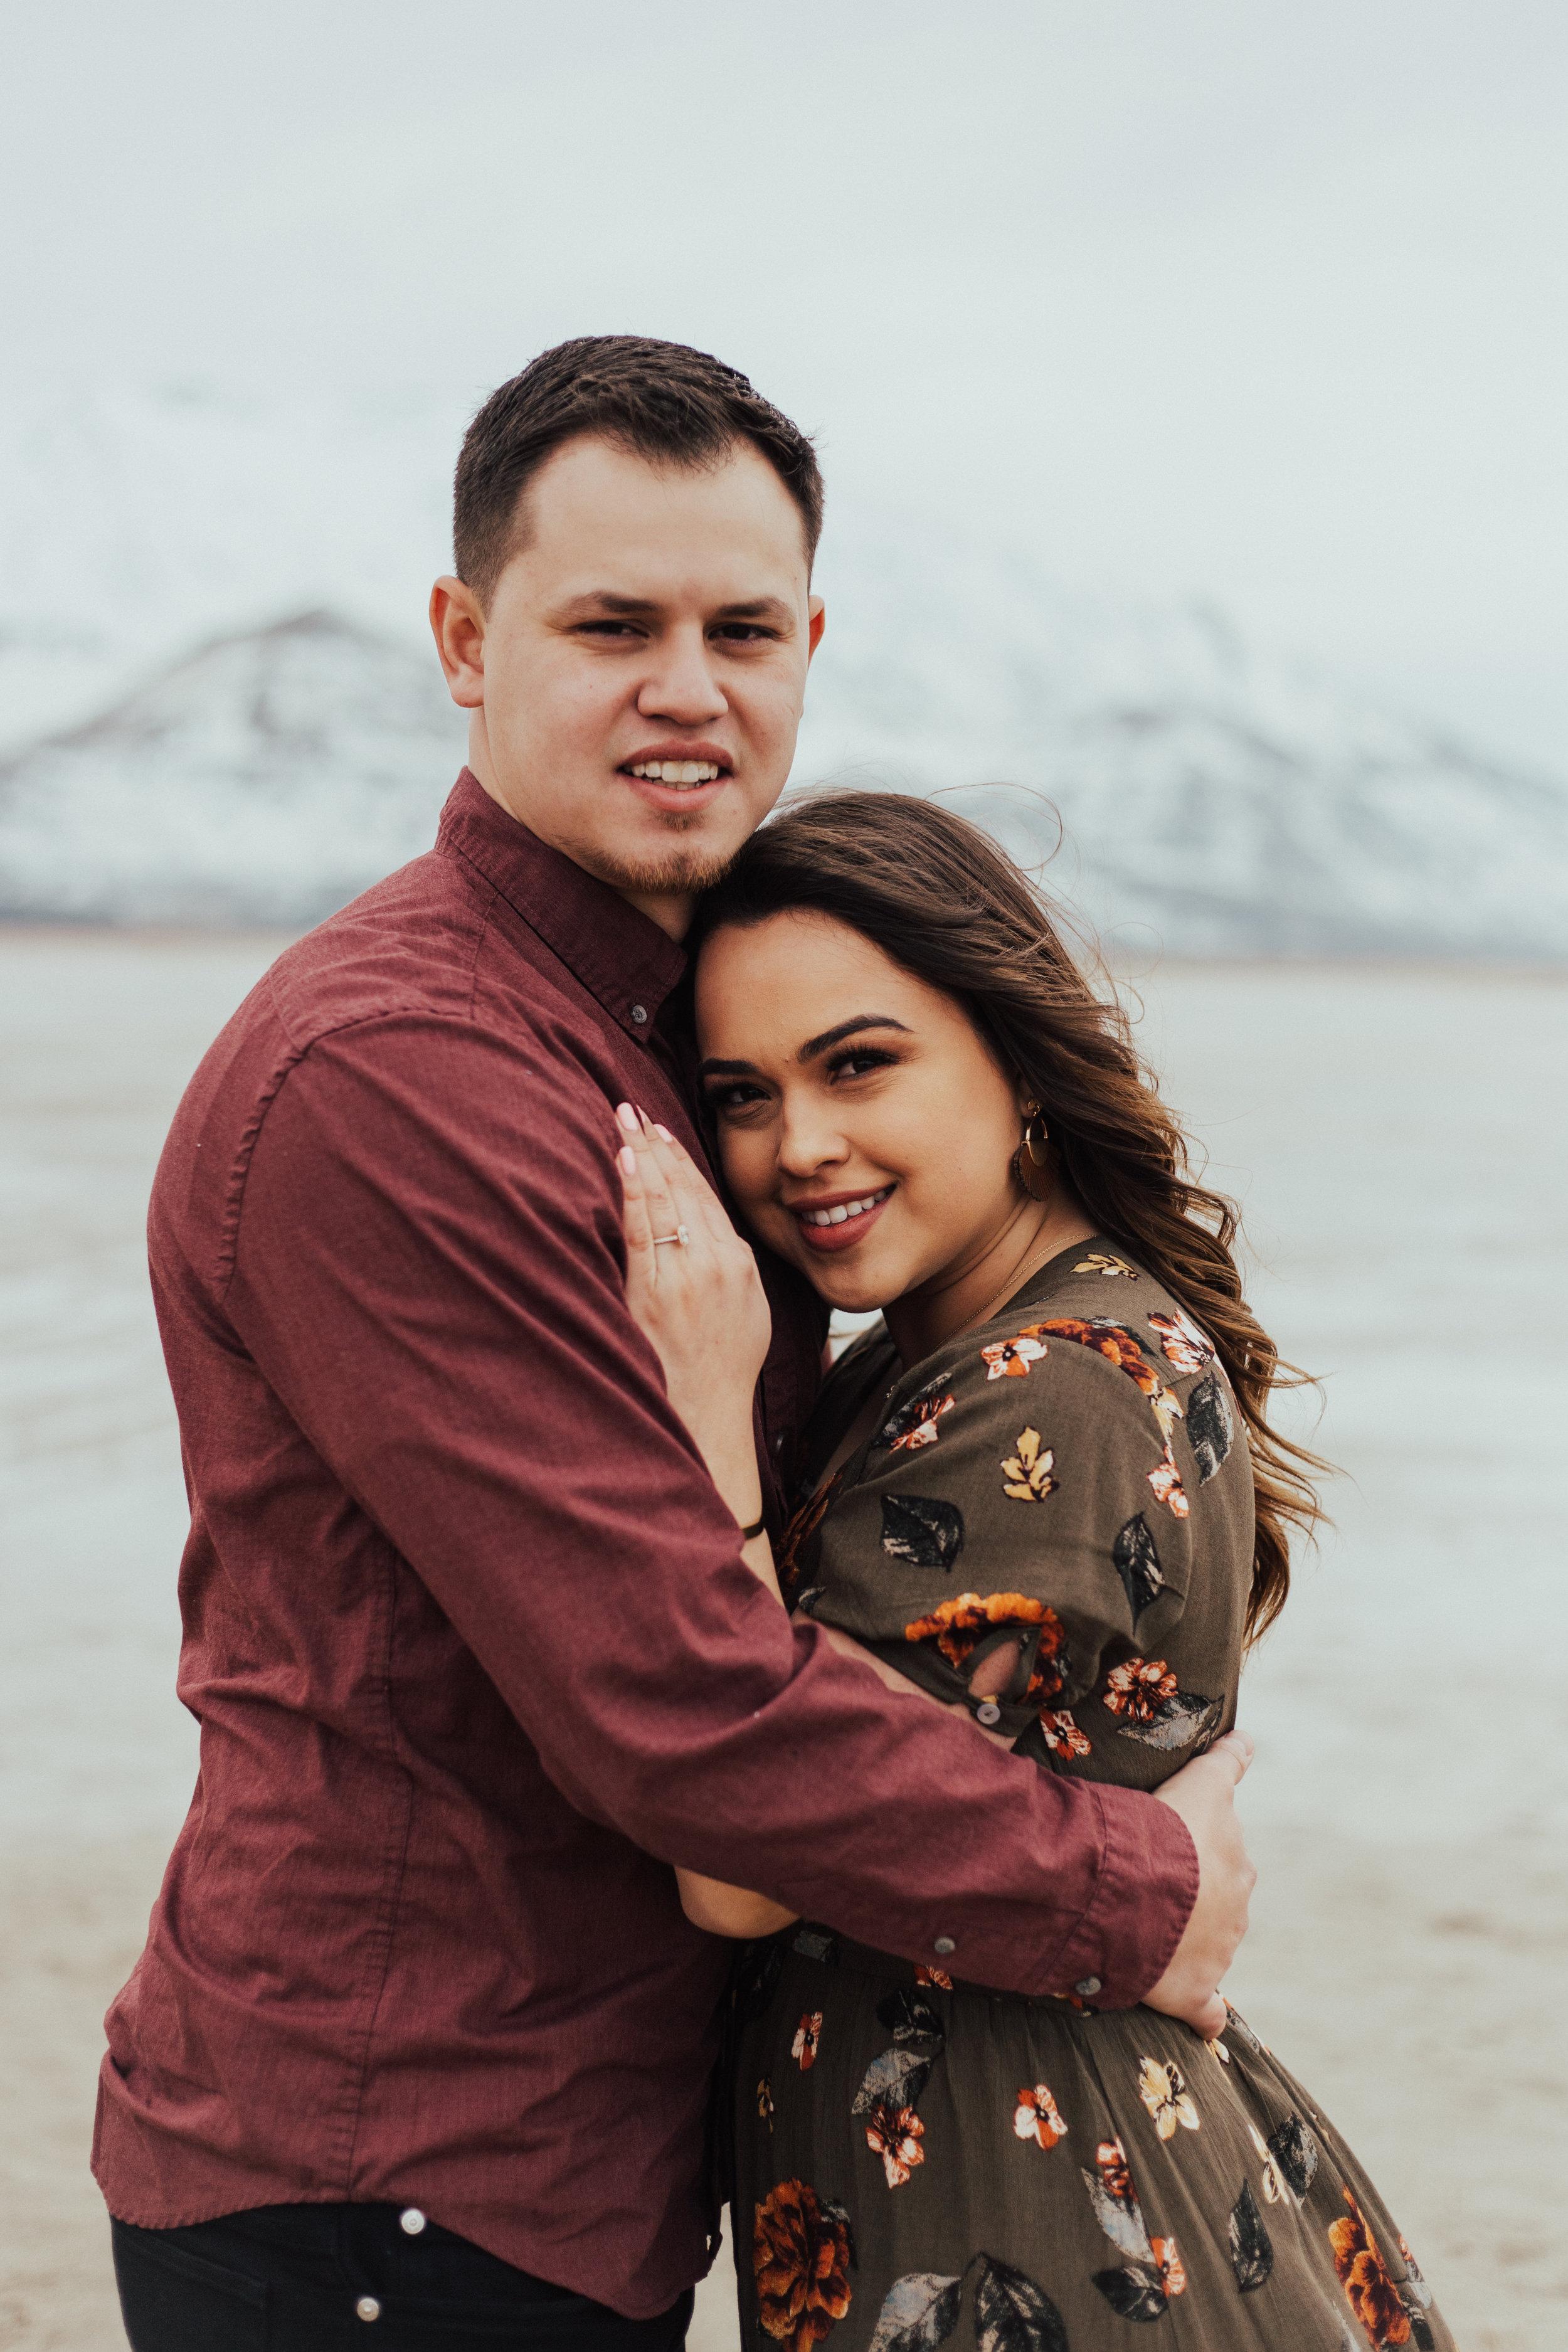 Romantic couple engagement photos Utah photographer